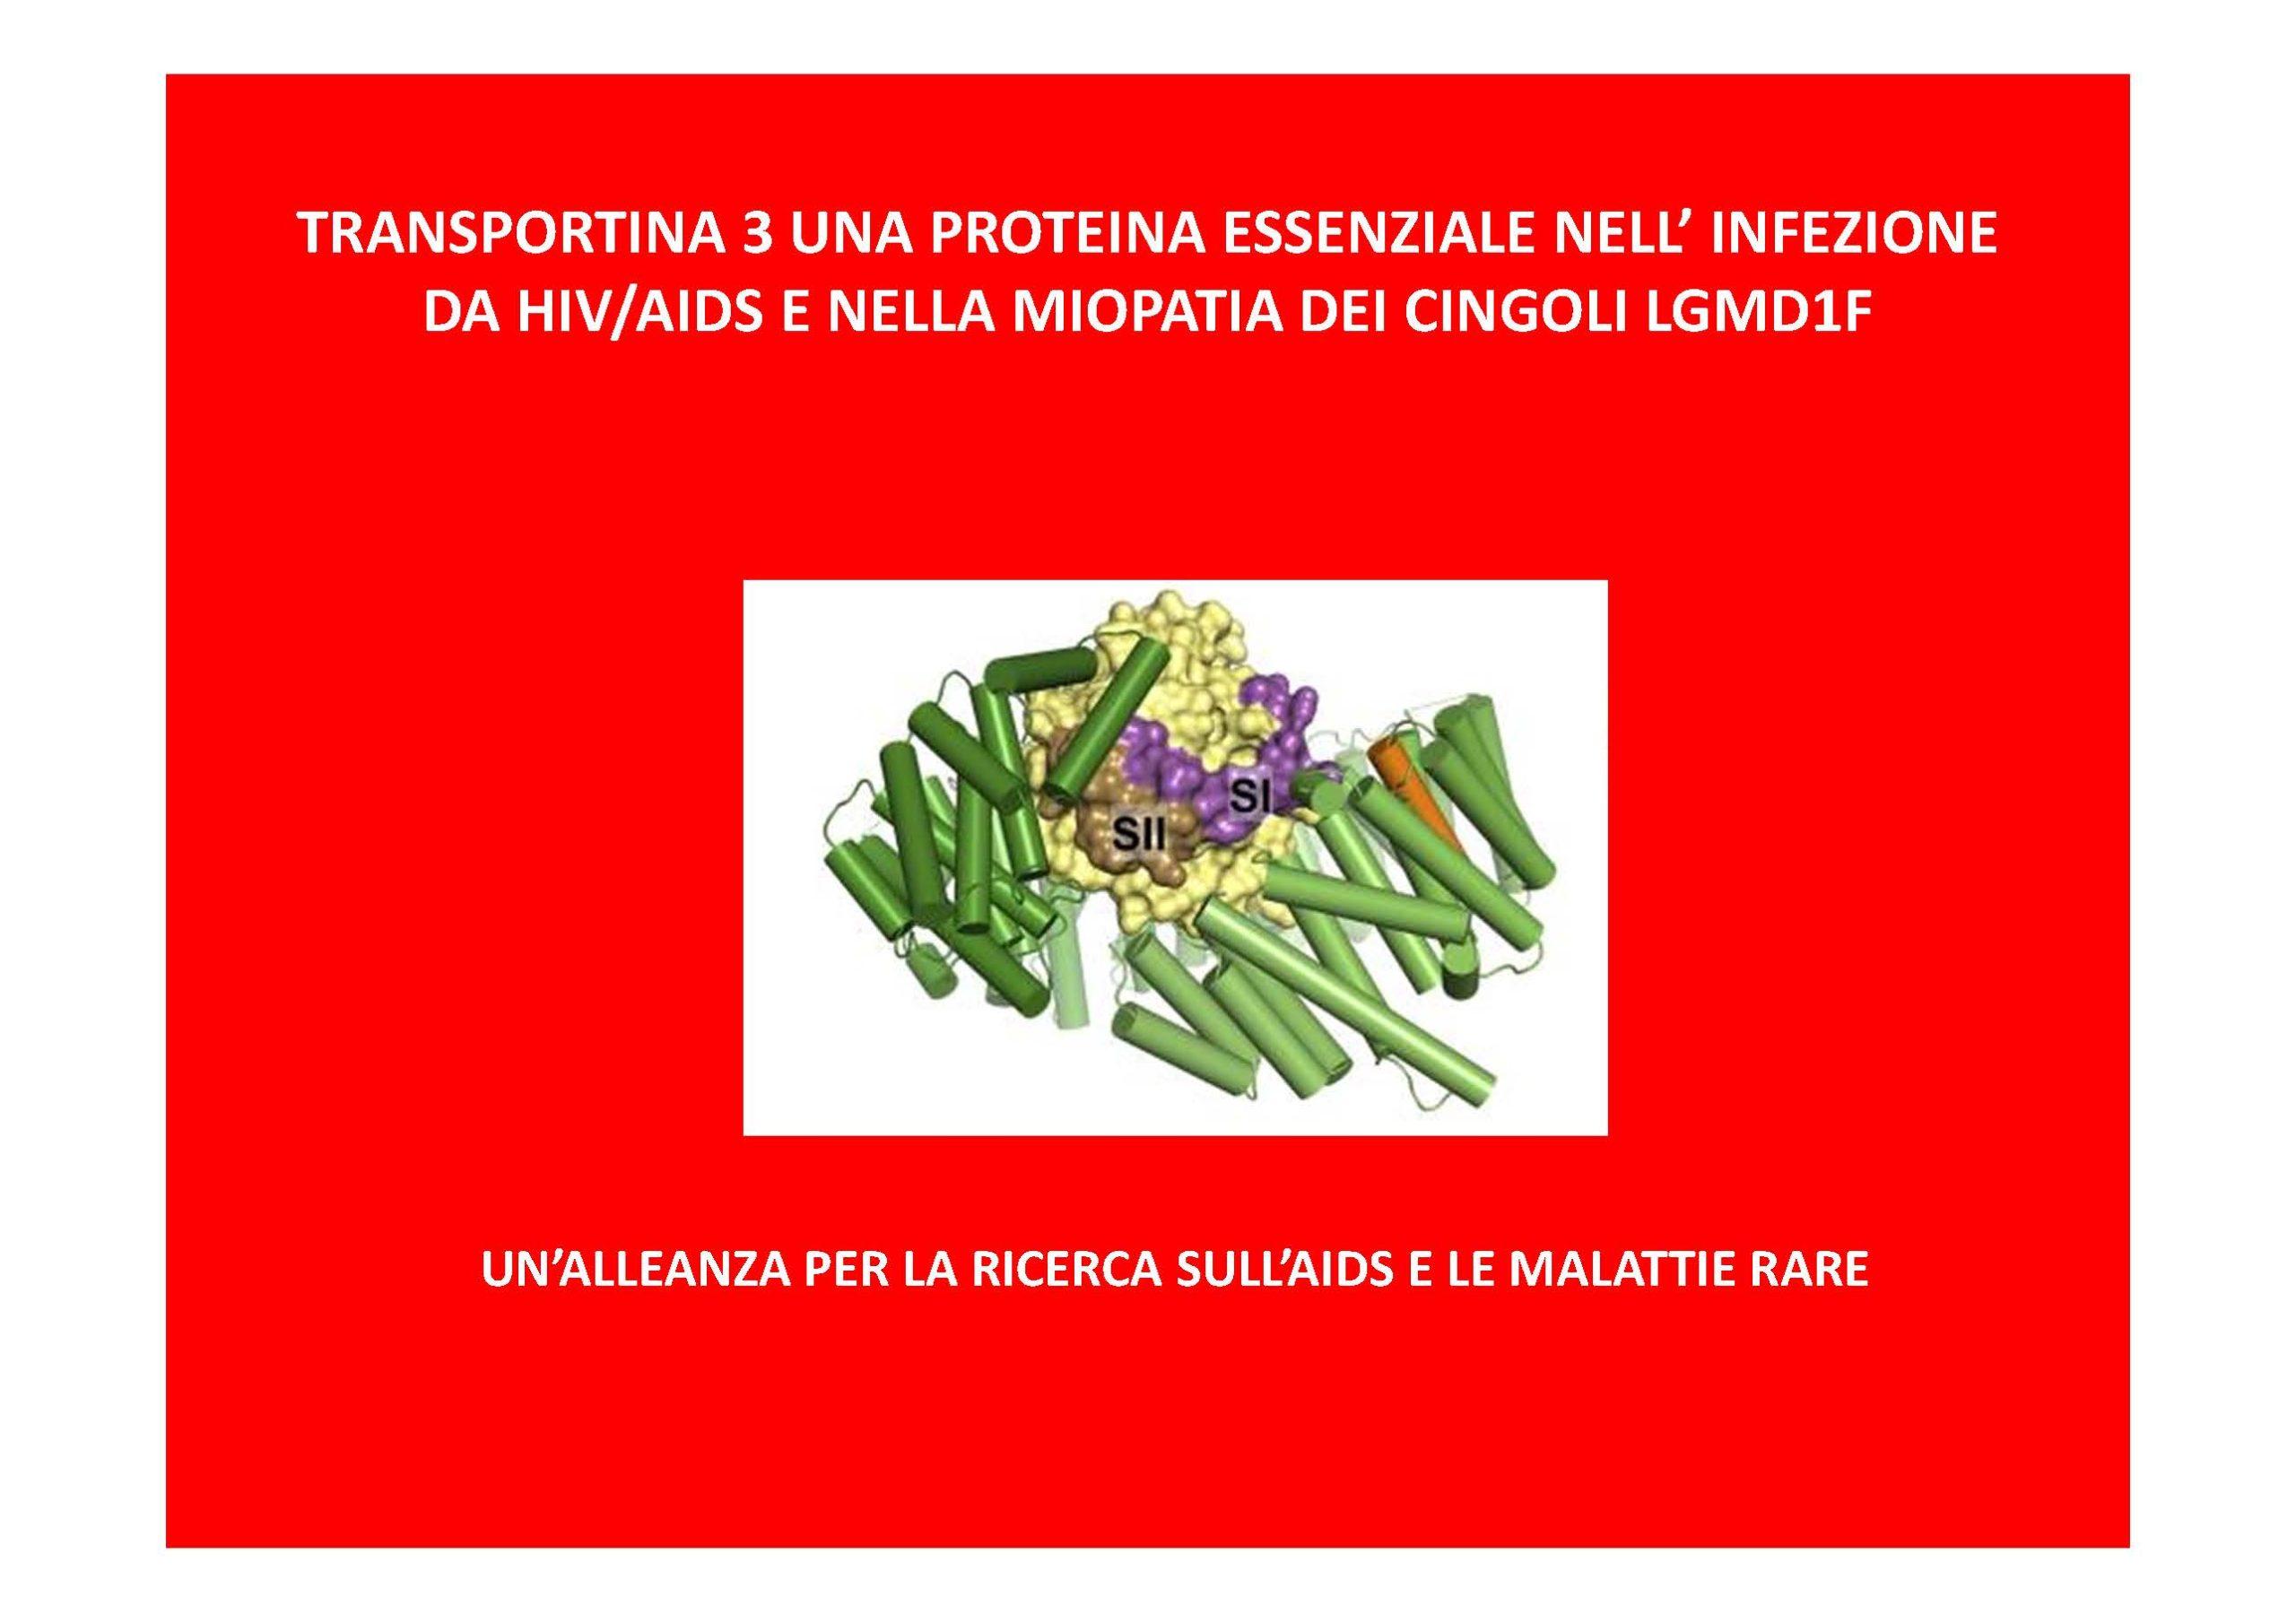 TRANSPORTINA 3 ITA-1_Pagina_1